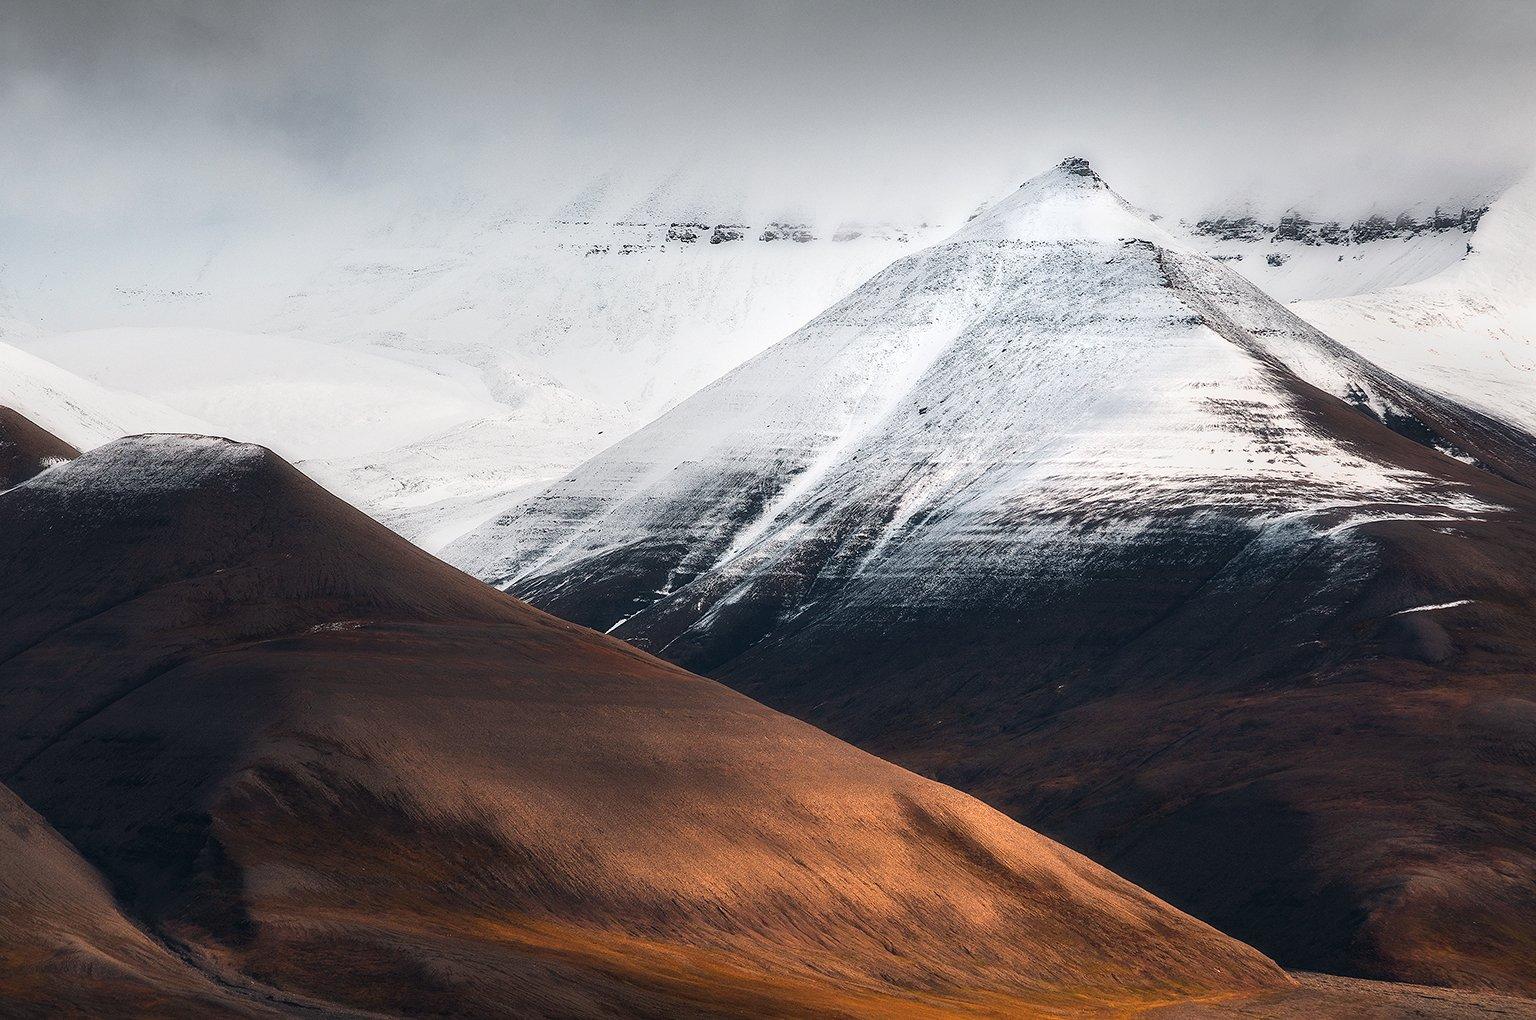 svalbard, spitsbergen, northnorway, islands, polar, arctic, summer, Csomai David